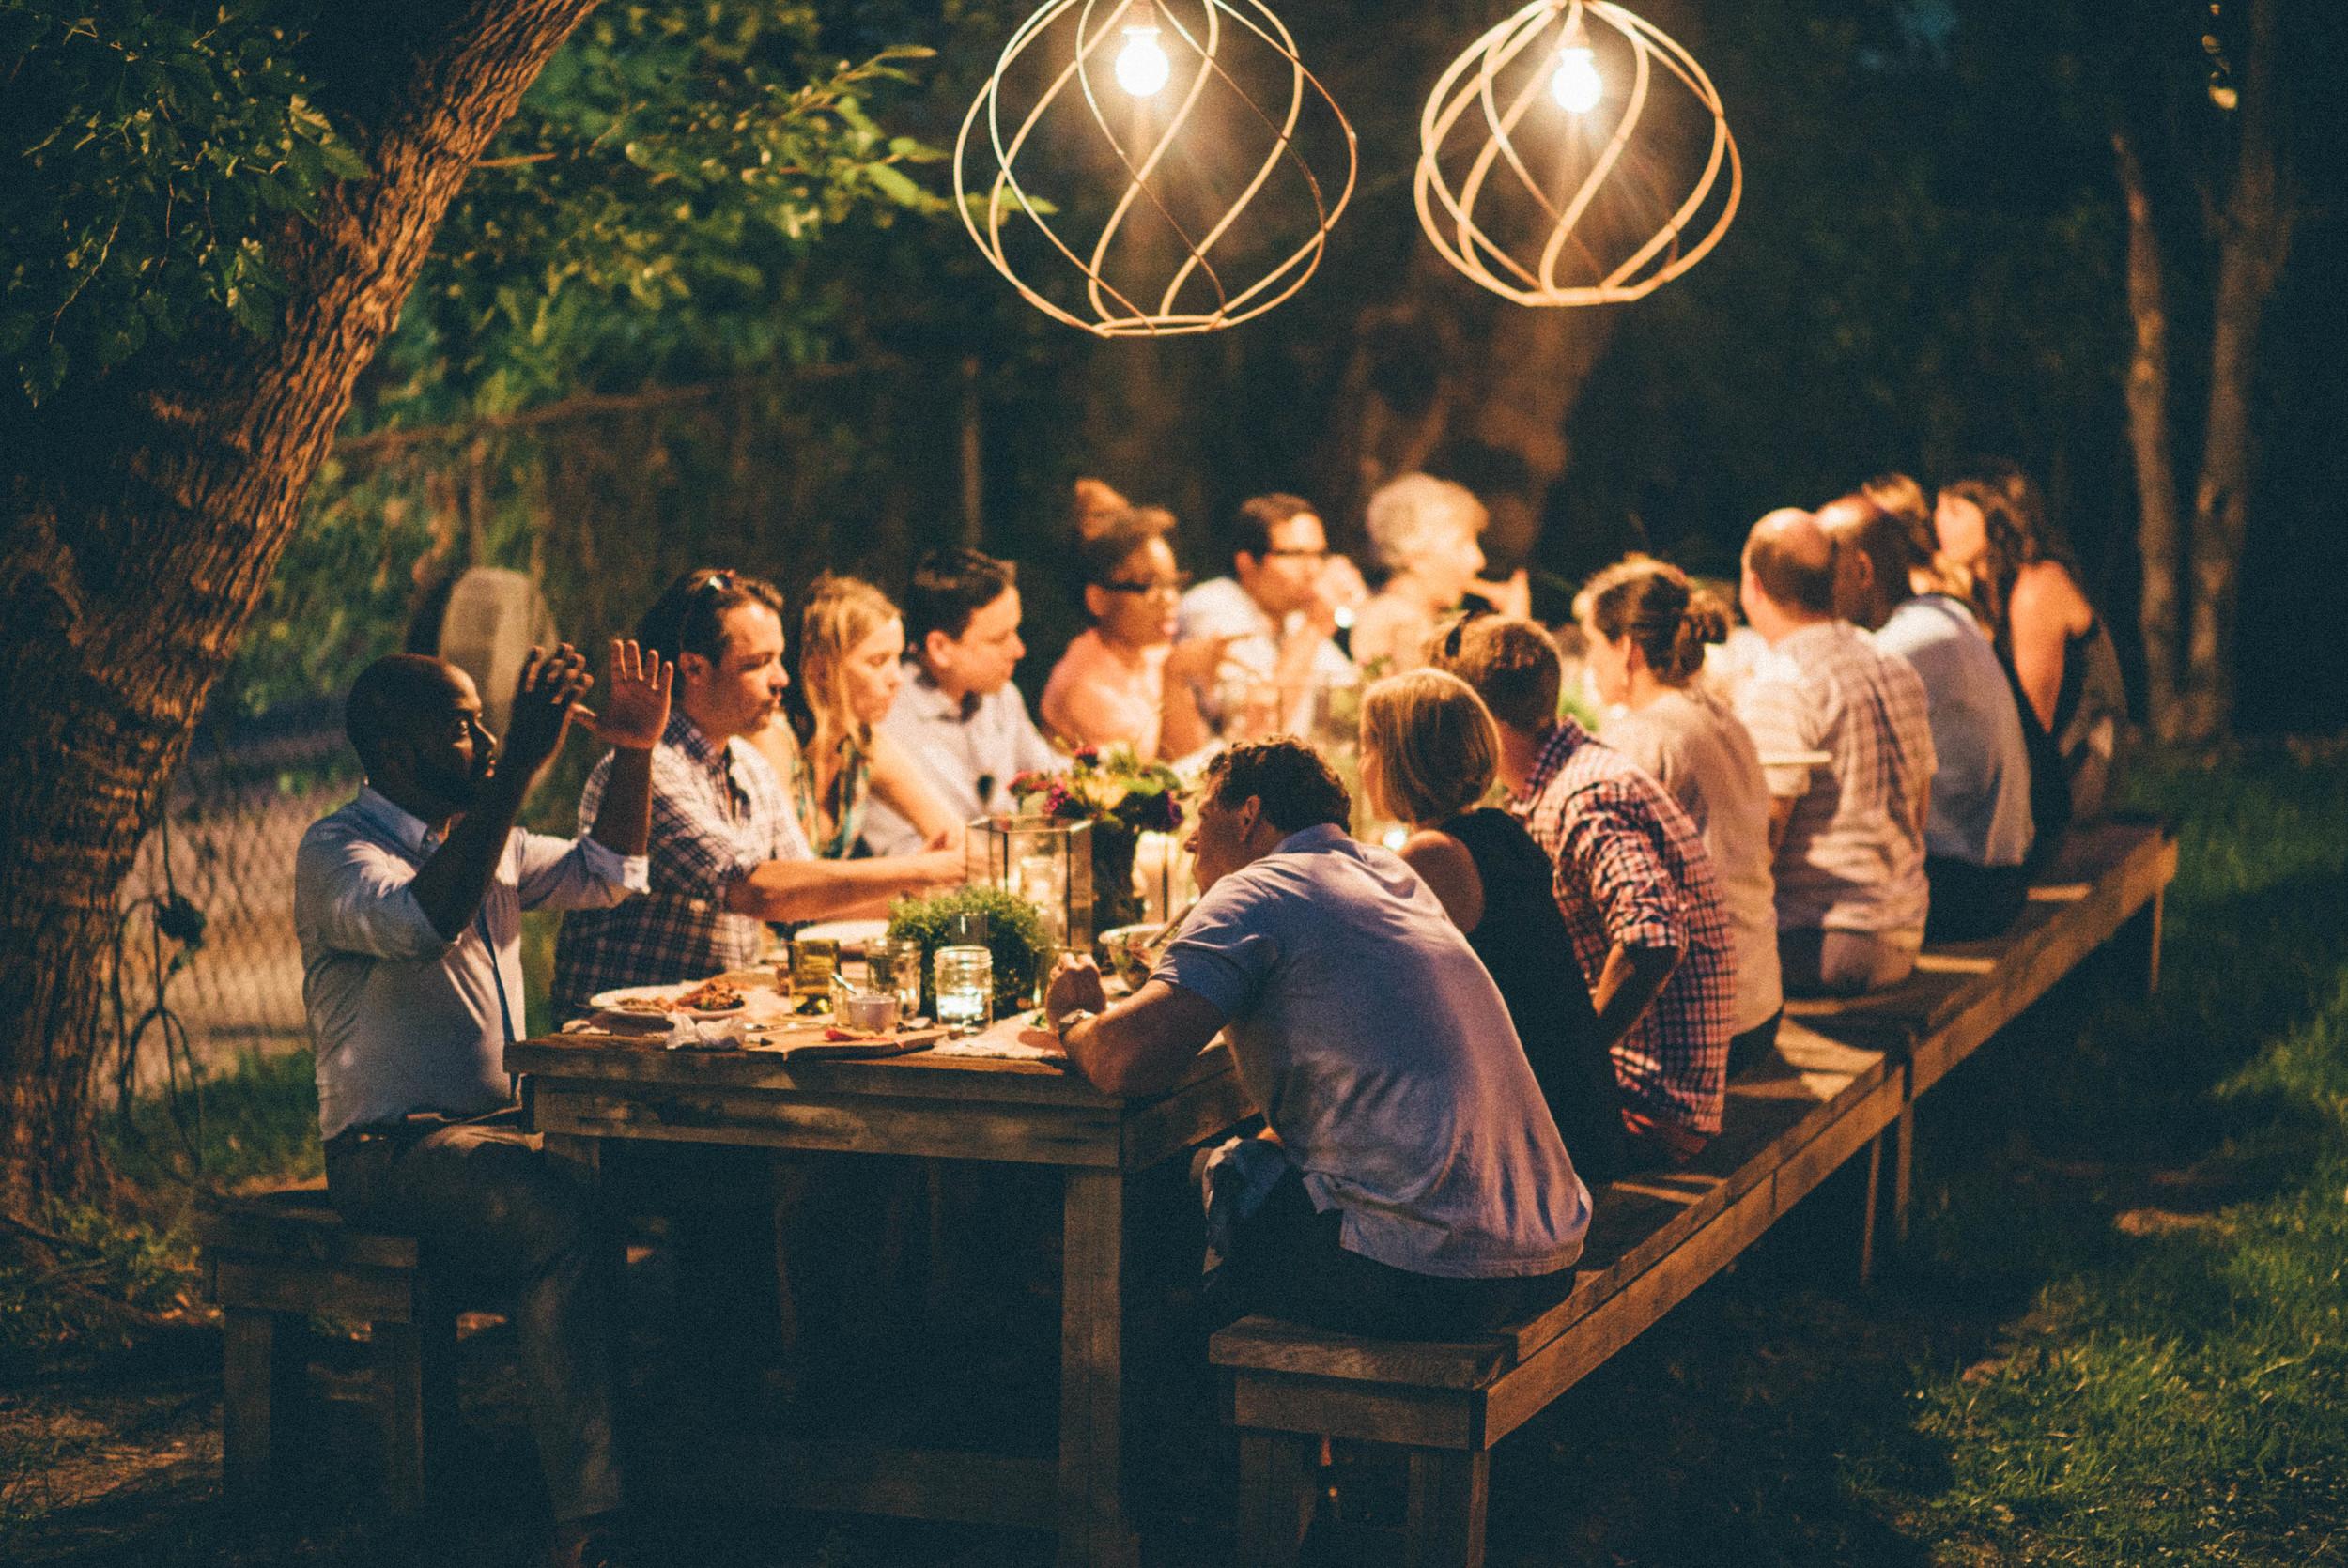 Neighbor's Table Party // Photo by Neighbor's Table